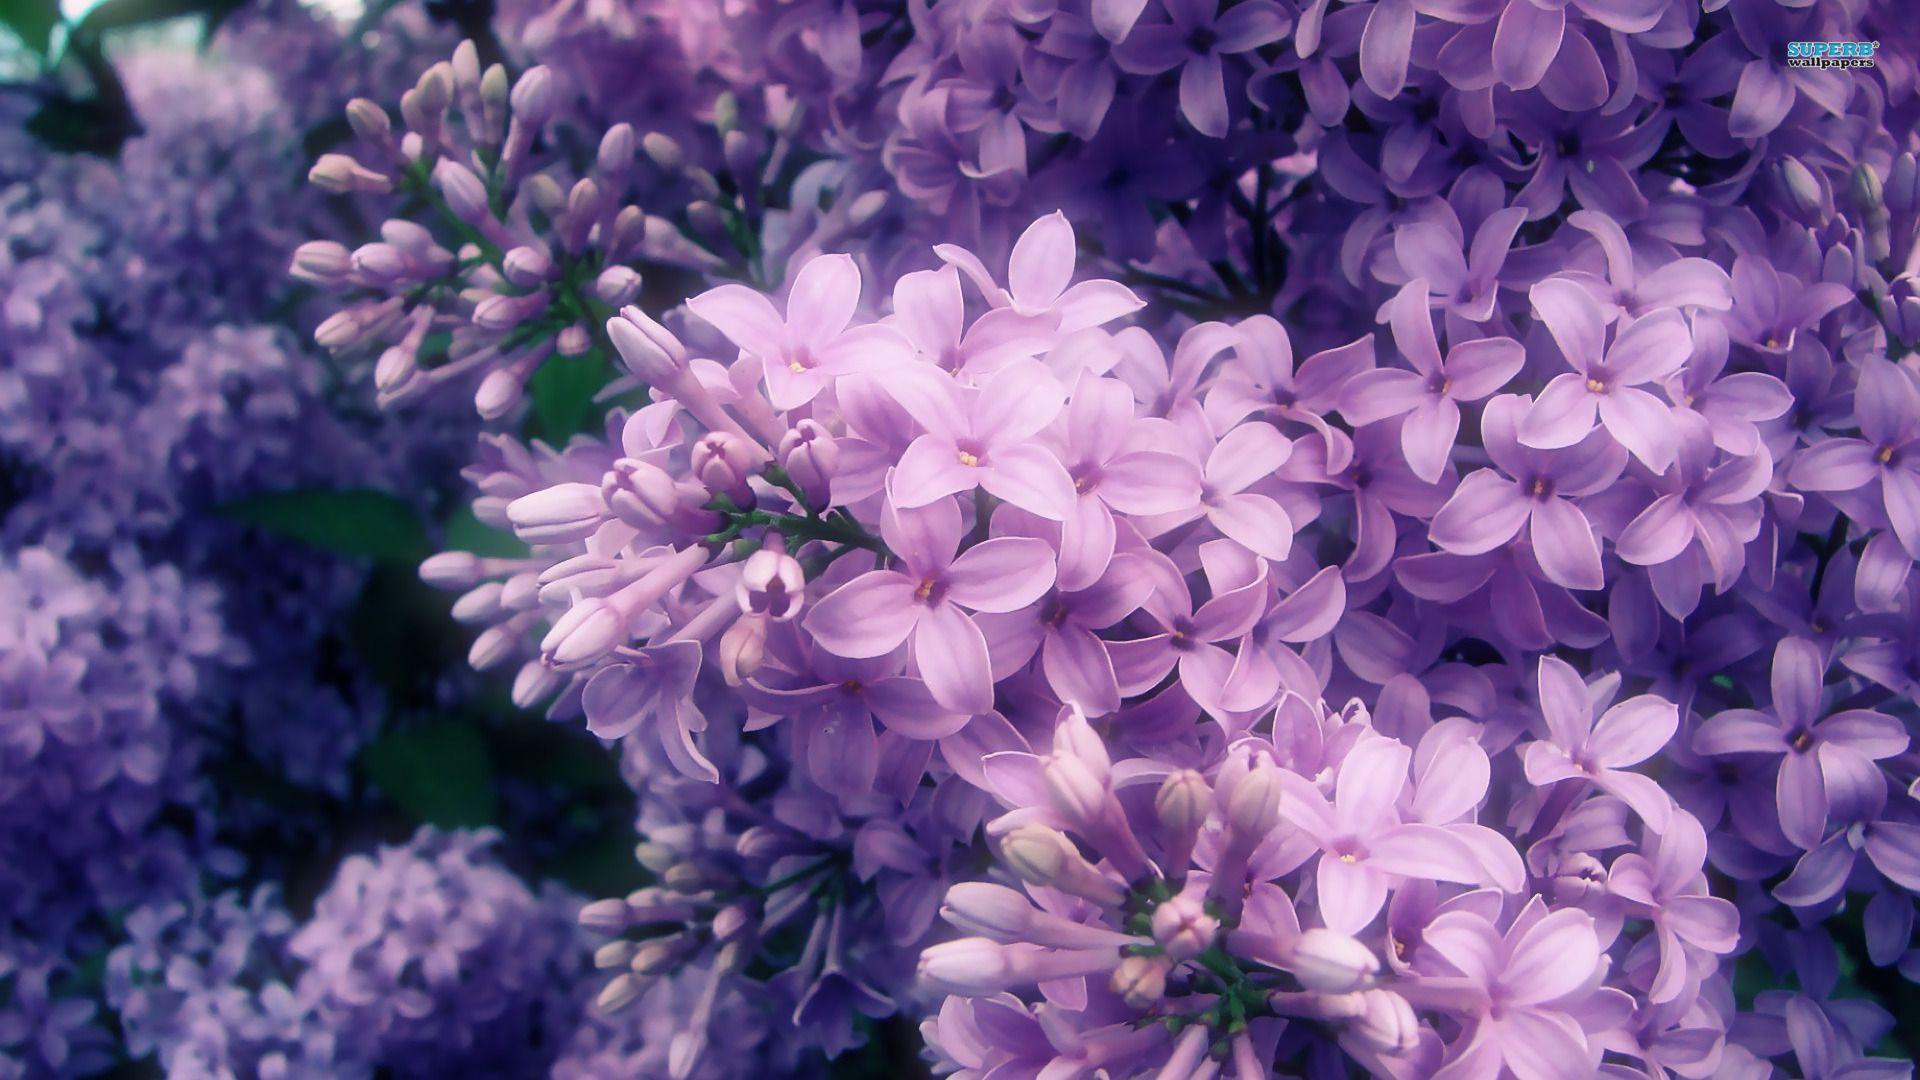 Lilac Lilac Wallpaper 1920x1080 Lilac Flowers Purple Flowers Purple Flowers Wallpaper